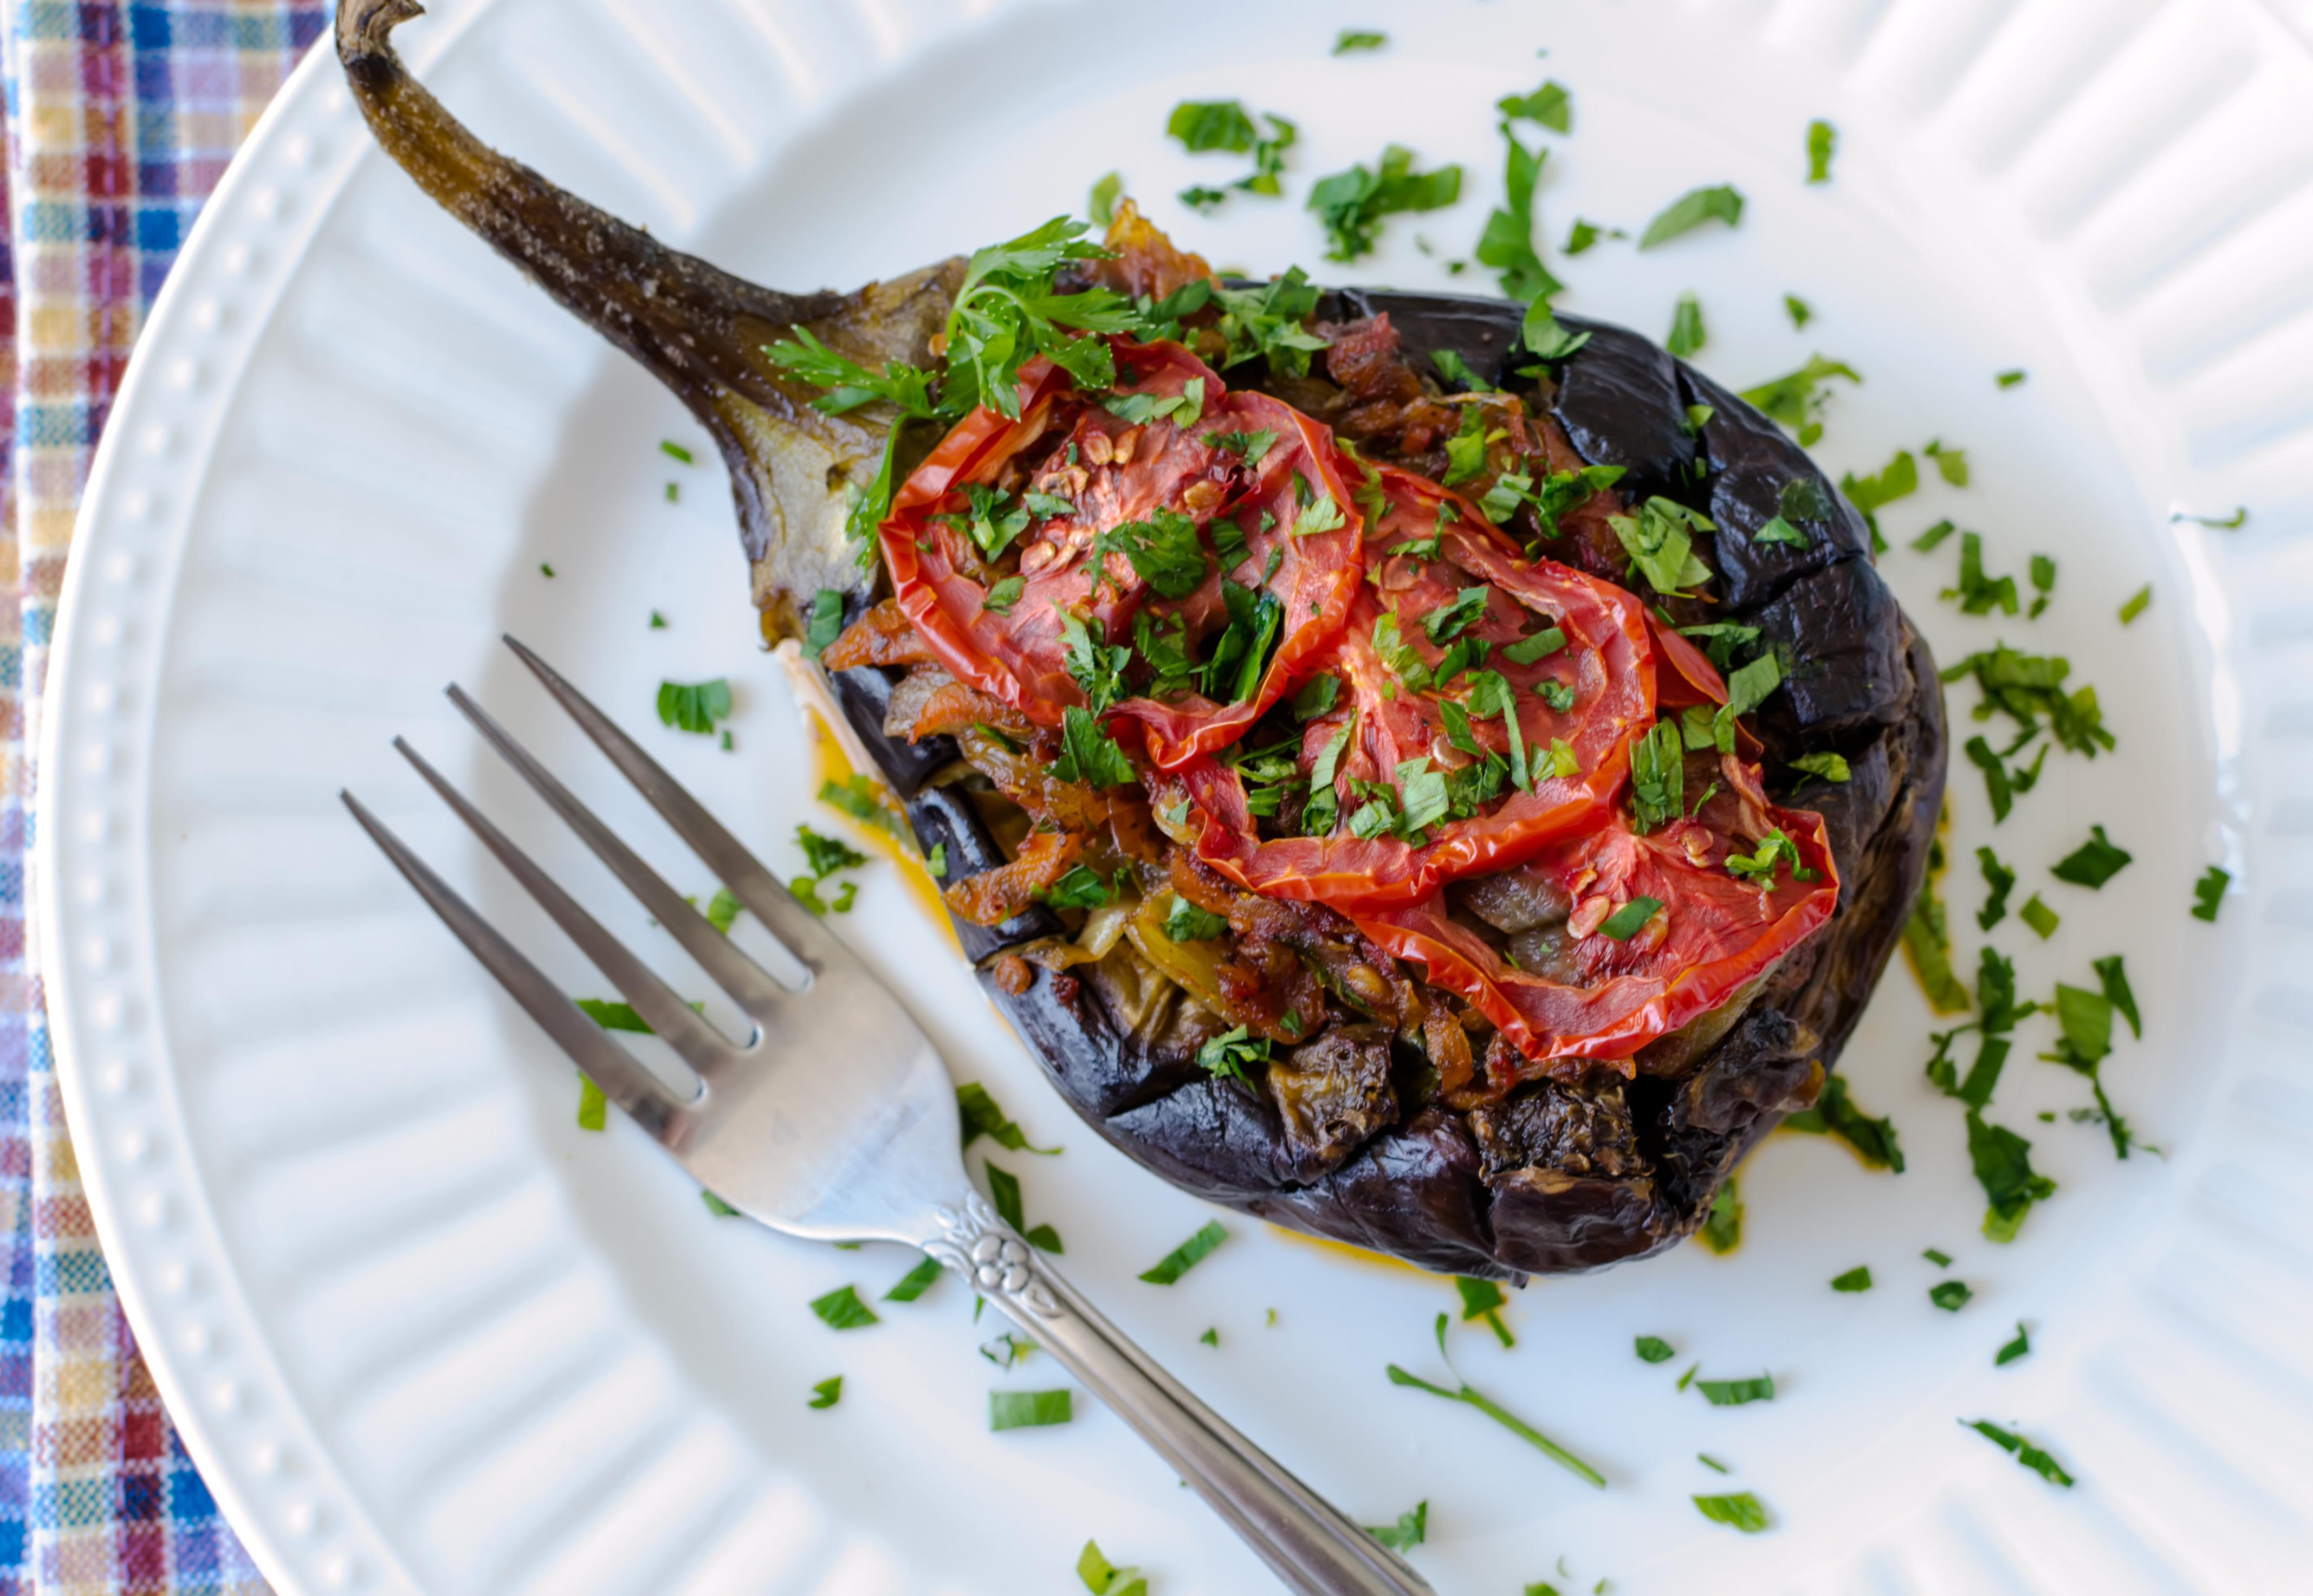 Image for Stuffed Eggplant with Lamb